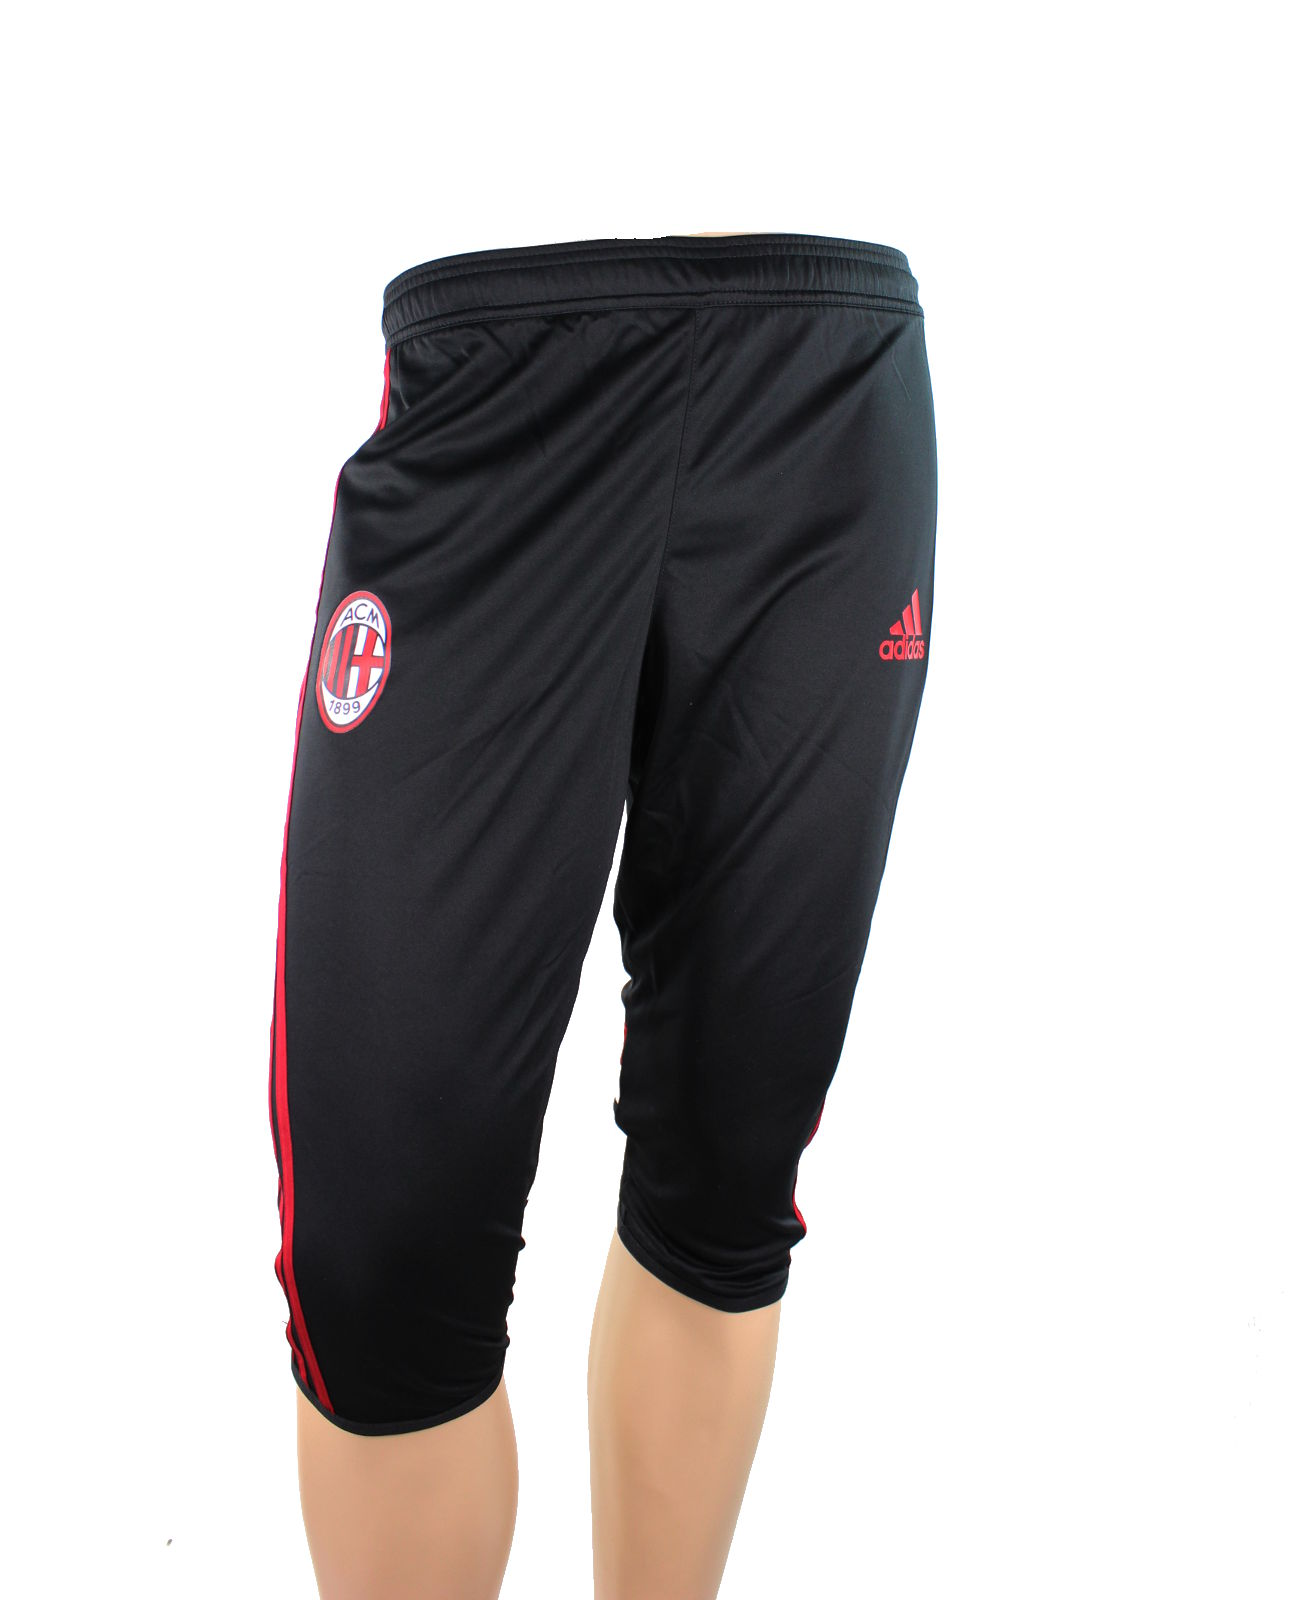 ac milan adidas pantaloncini shorts hose 3 4 pant 2014 15 training training me. Black Bedroom Furniture Sets. Home Design Ideas